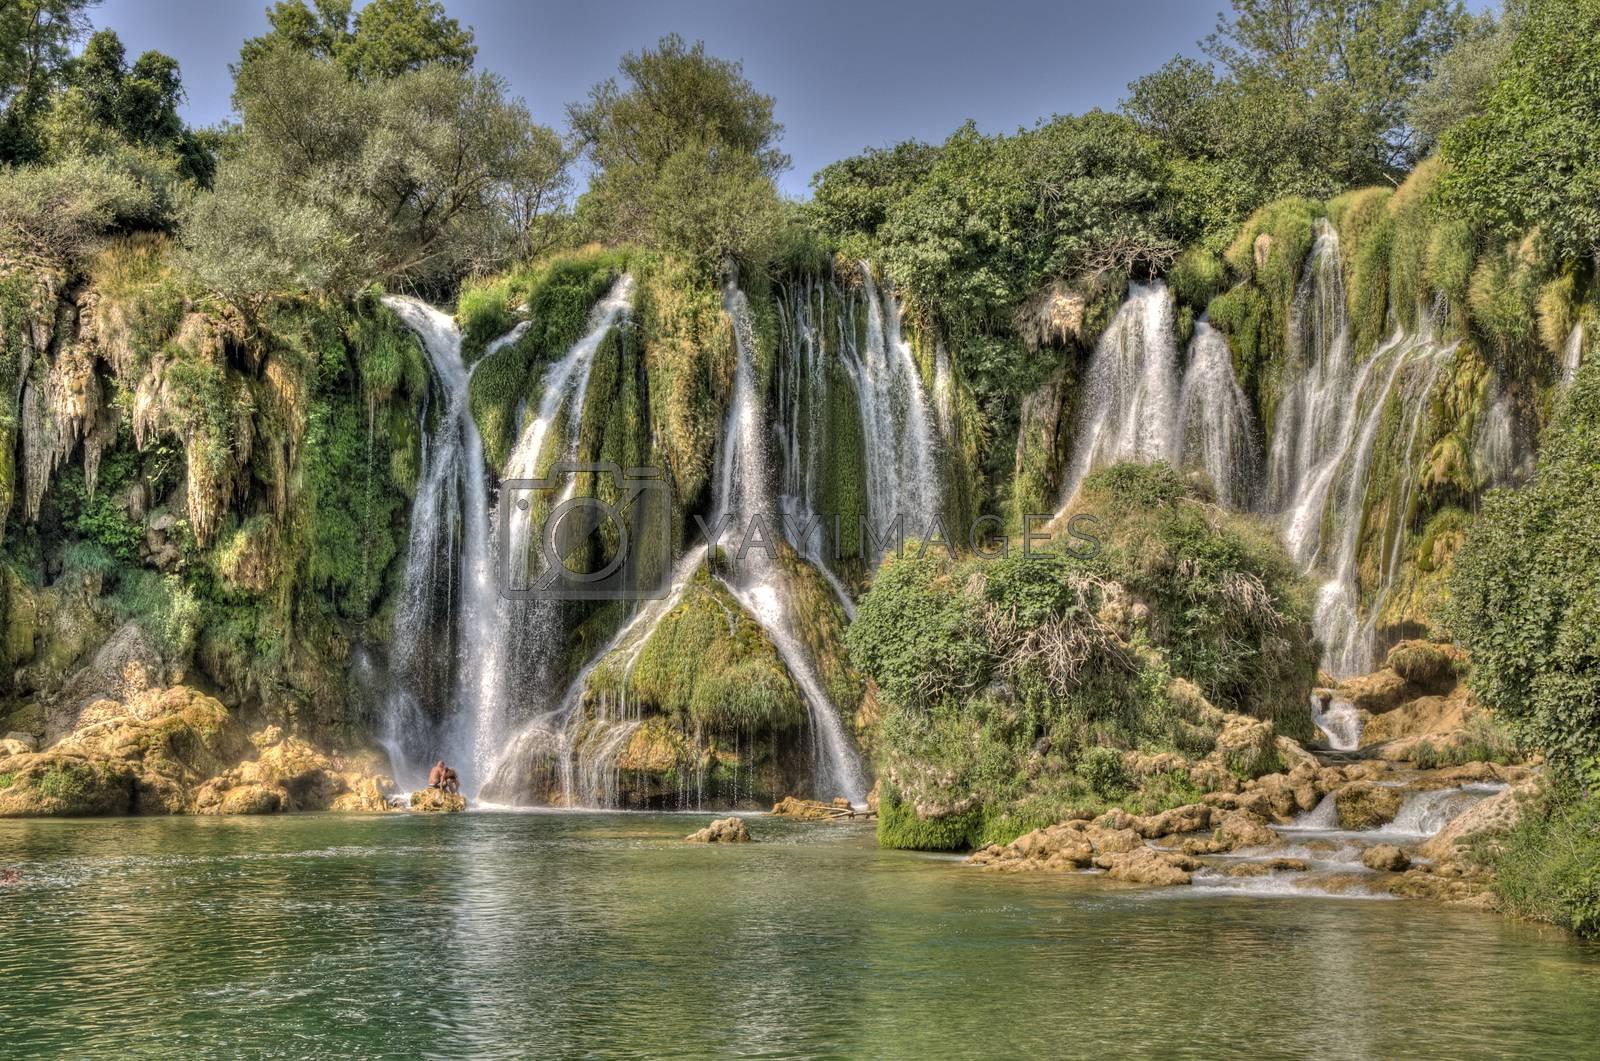 Royalty free image of Kravice waterfalls in Bosnia Herzegovina by anderm